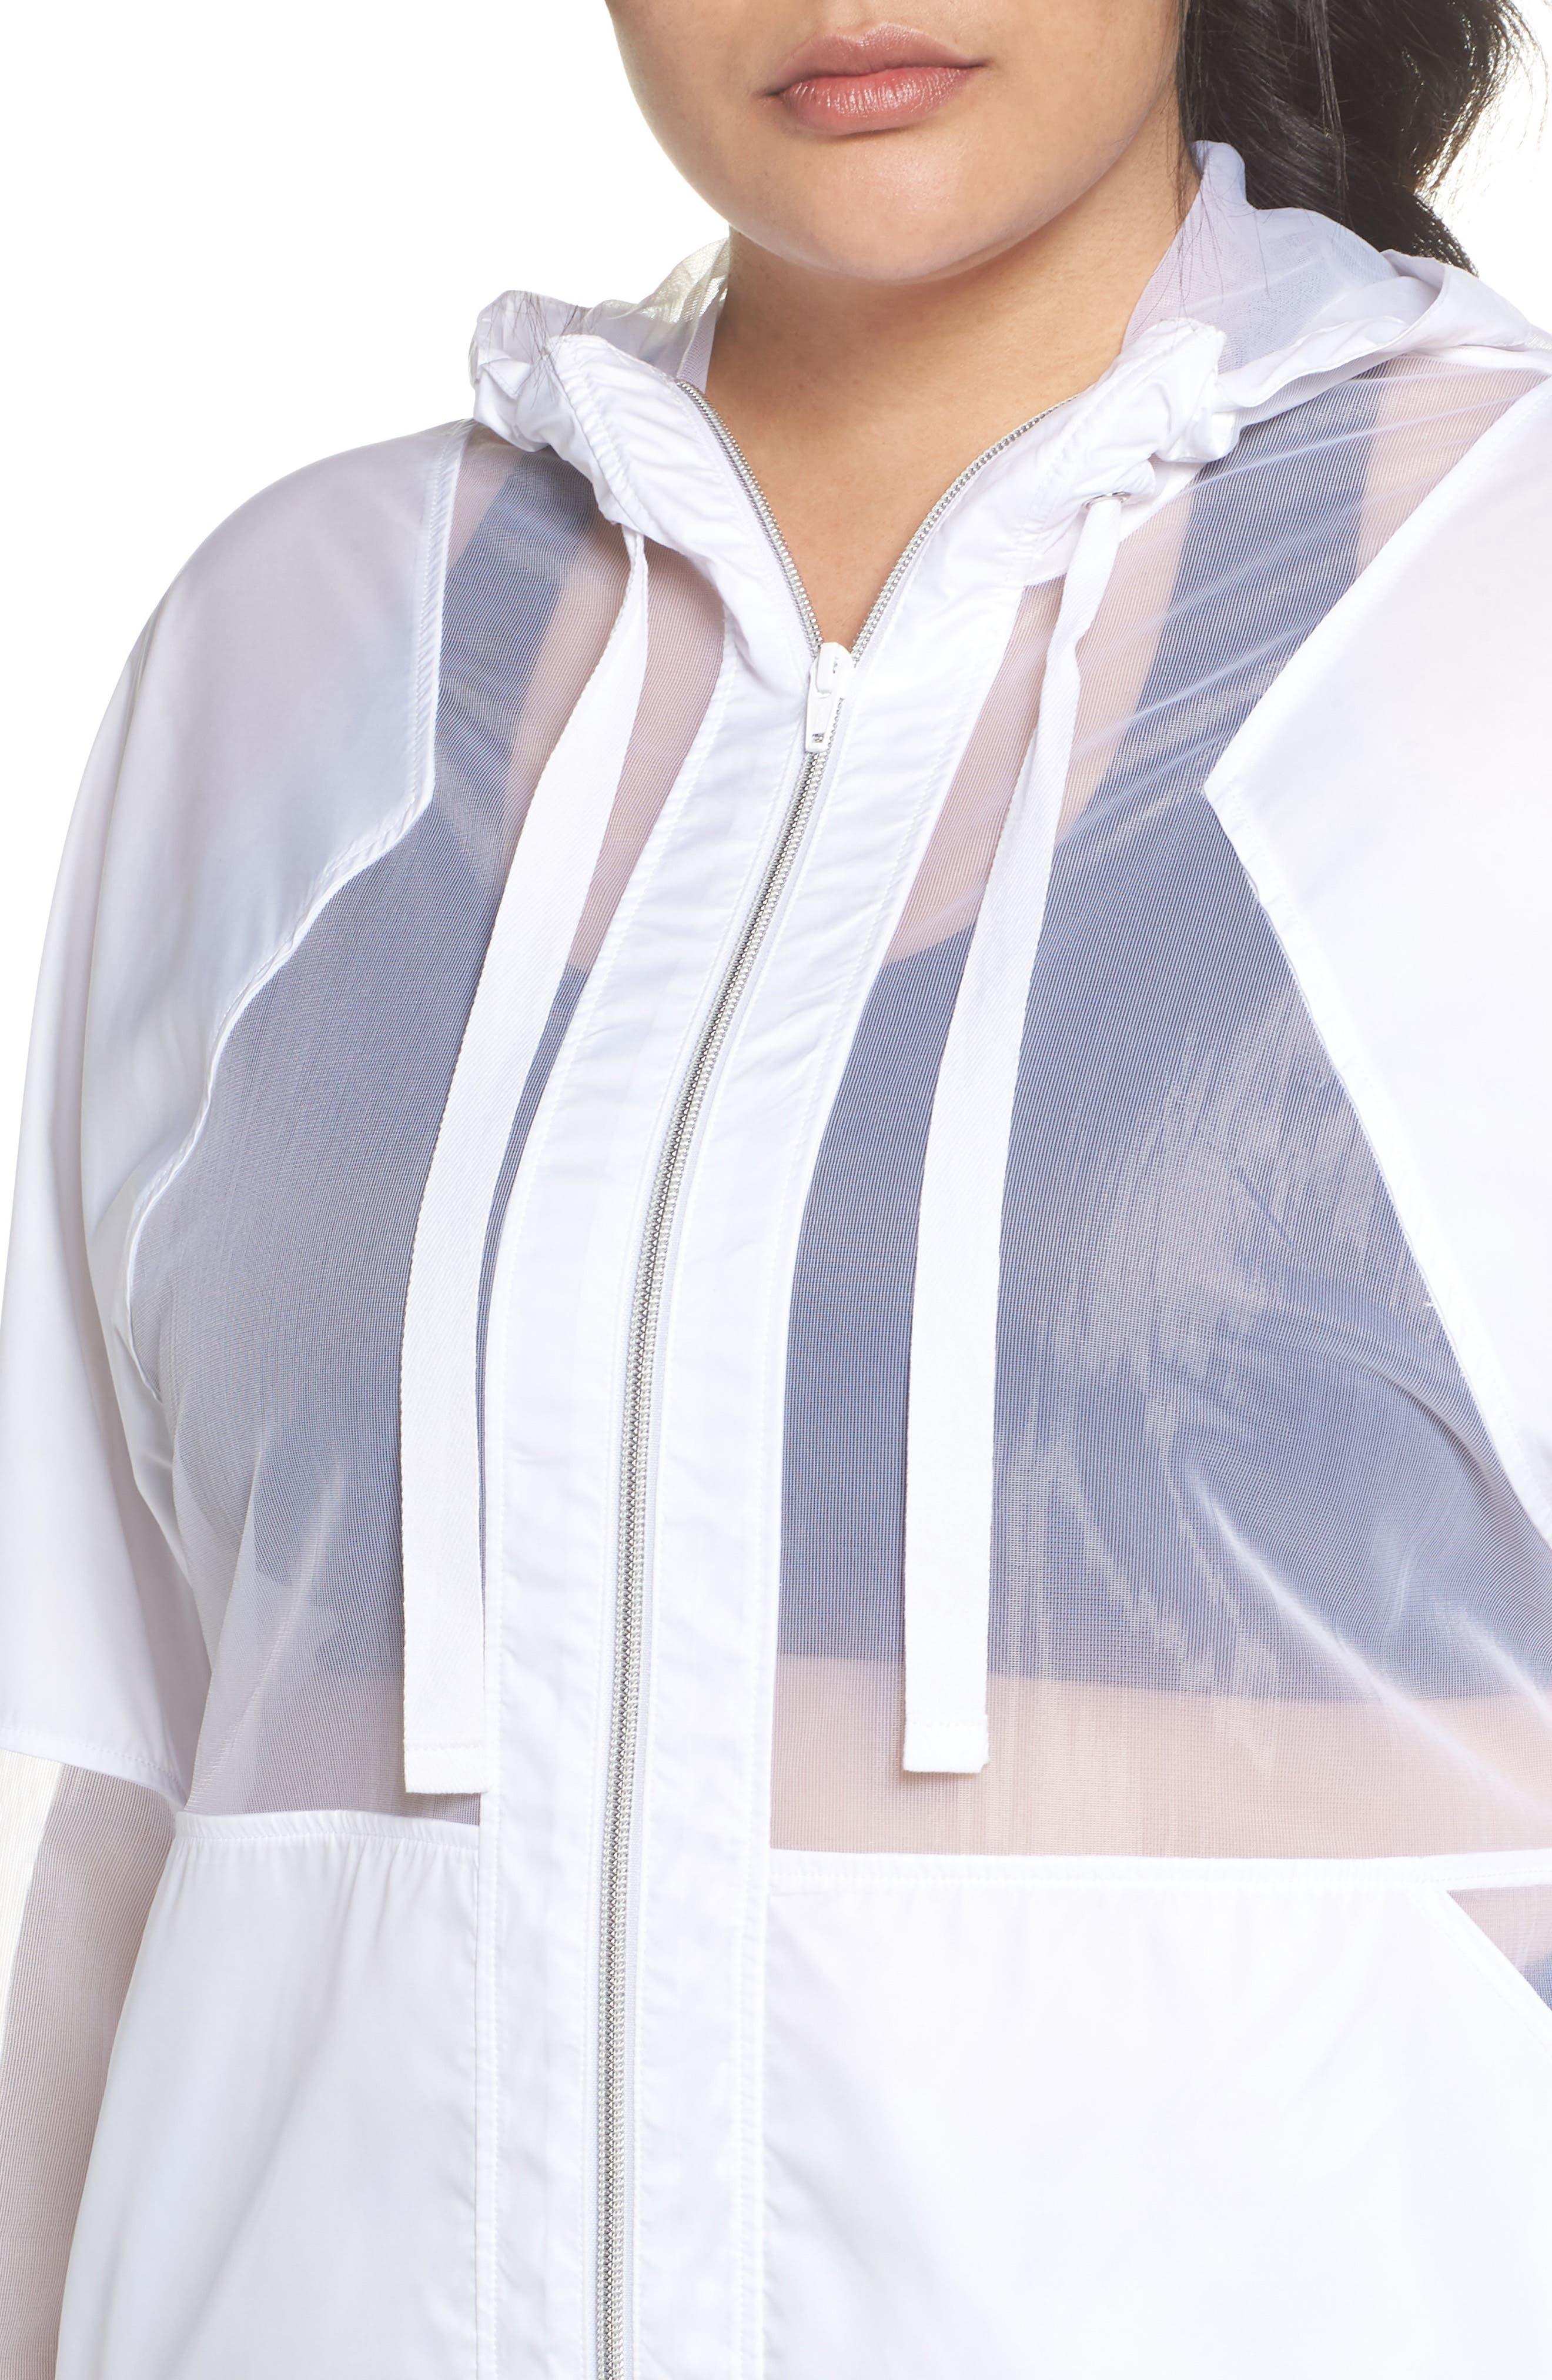 Sheer Mix Jacket,                             Alternate thumbnail 4, color,                             White